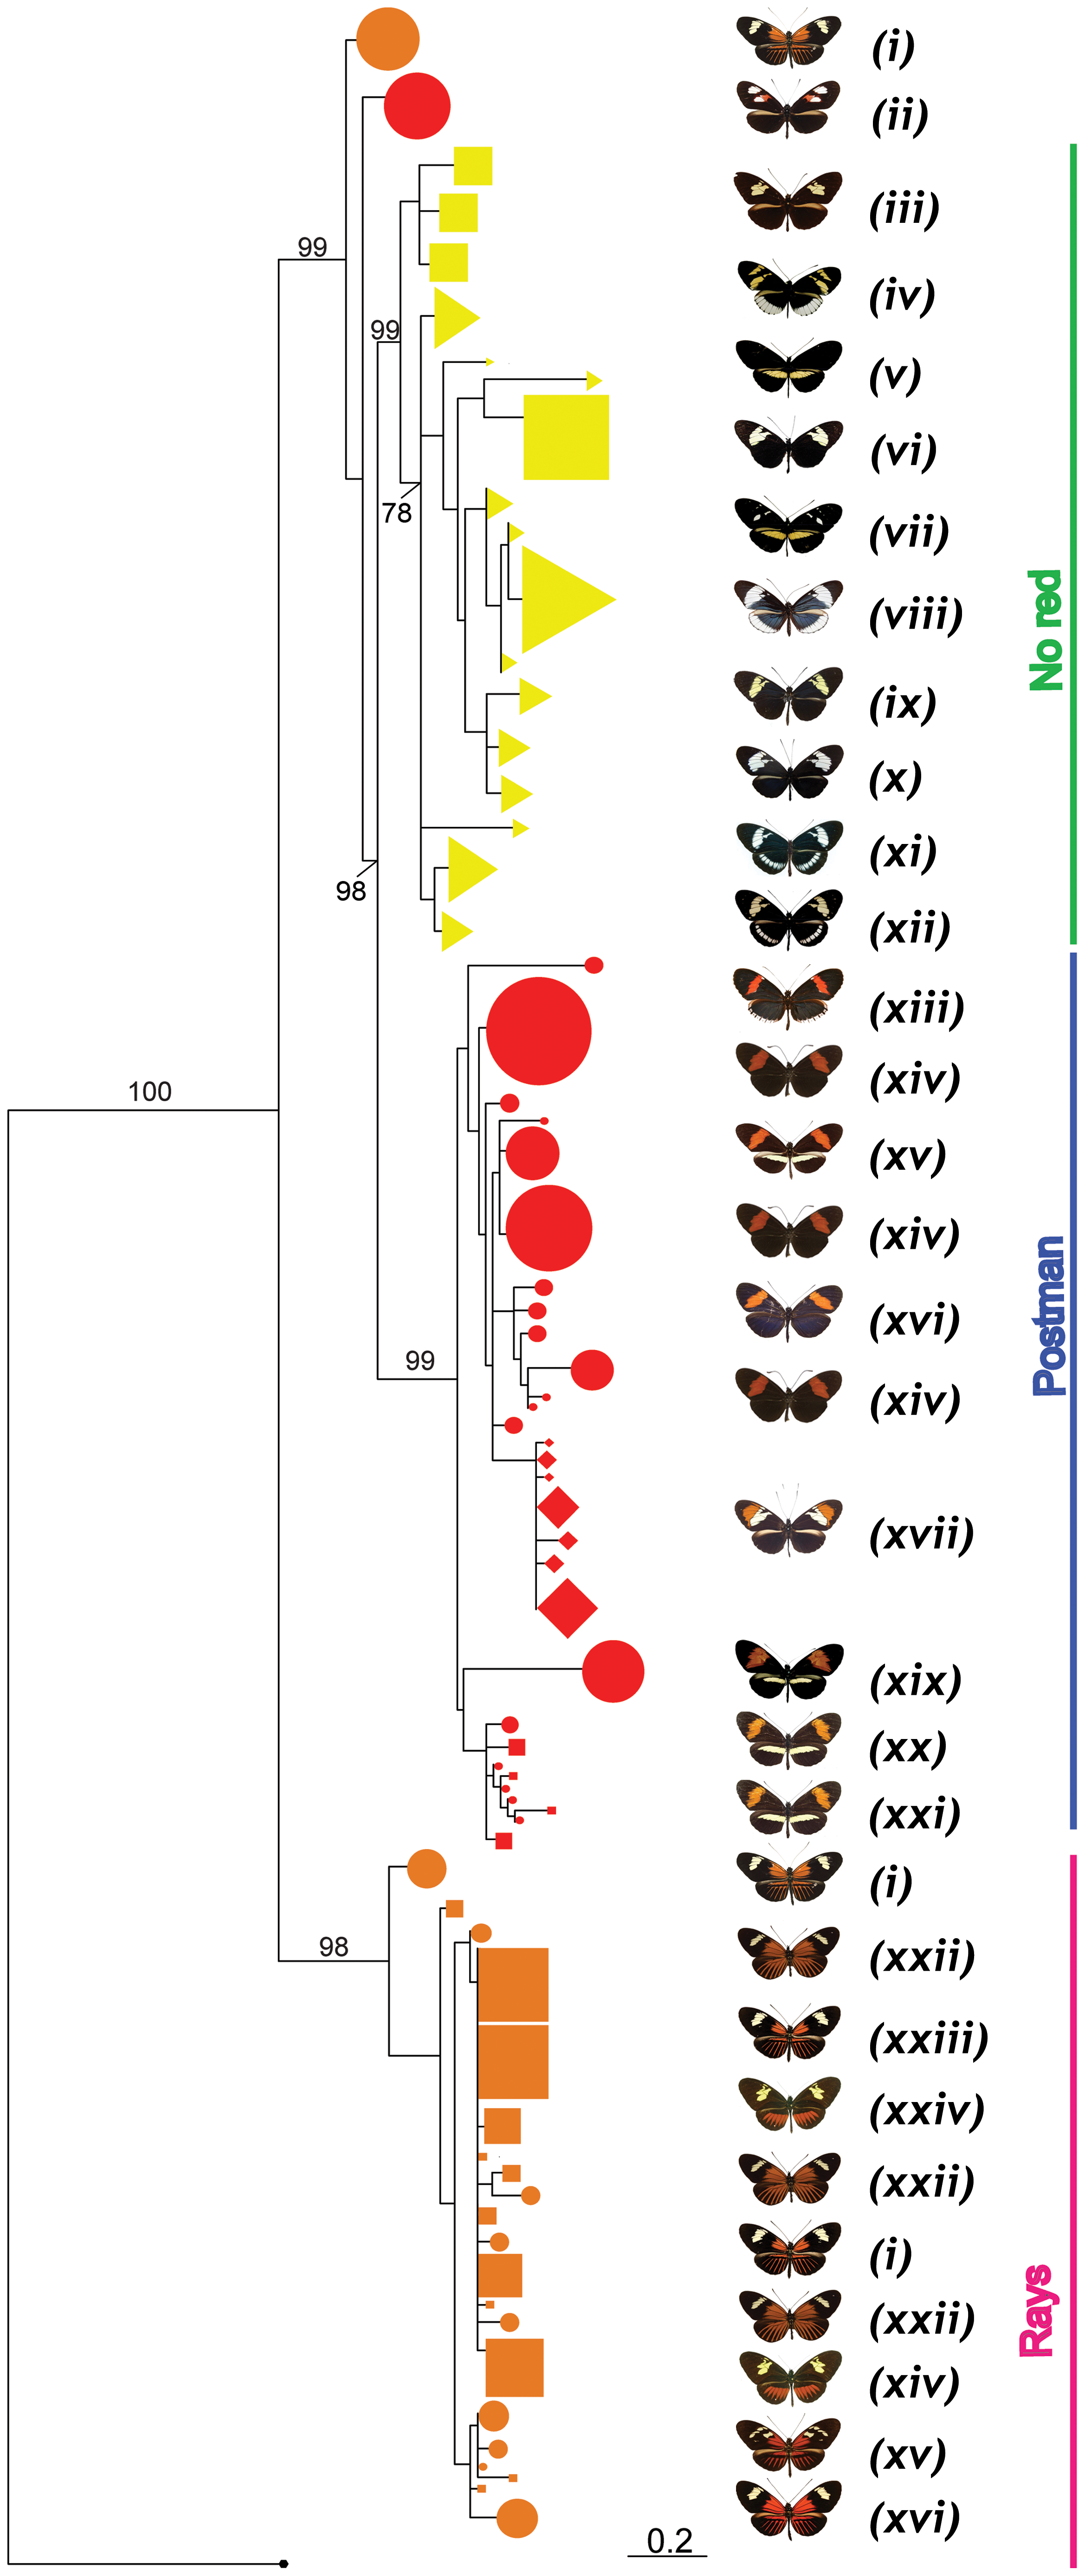 Phylogenetic clustering at HmB453k inferred by Maximum Likelihood.